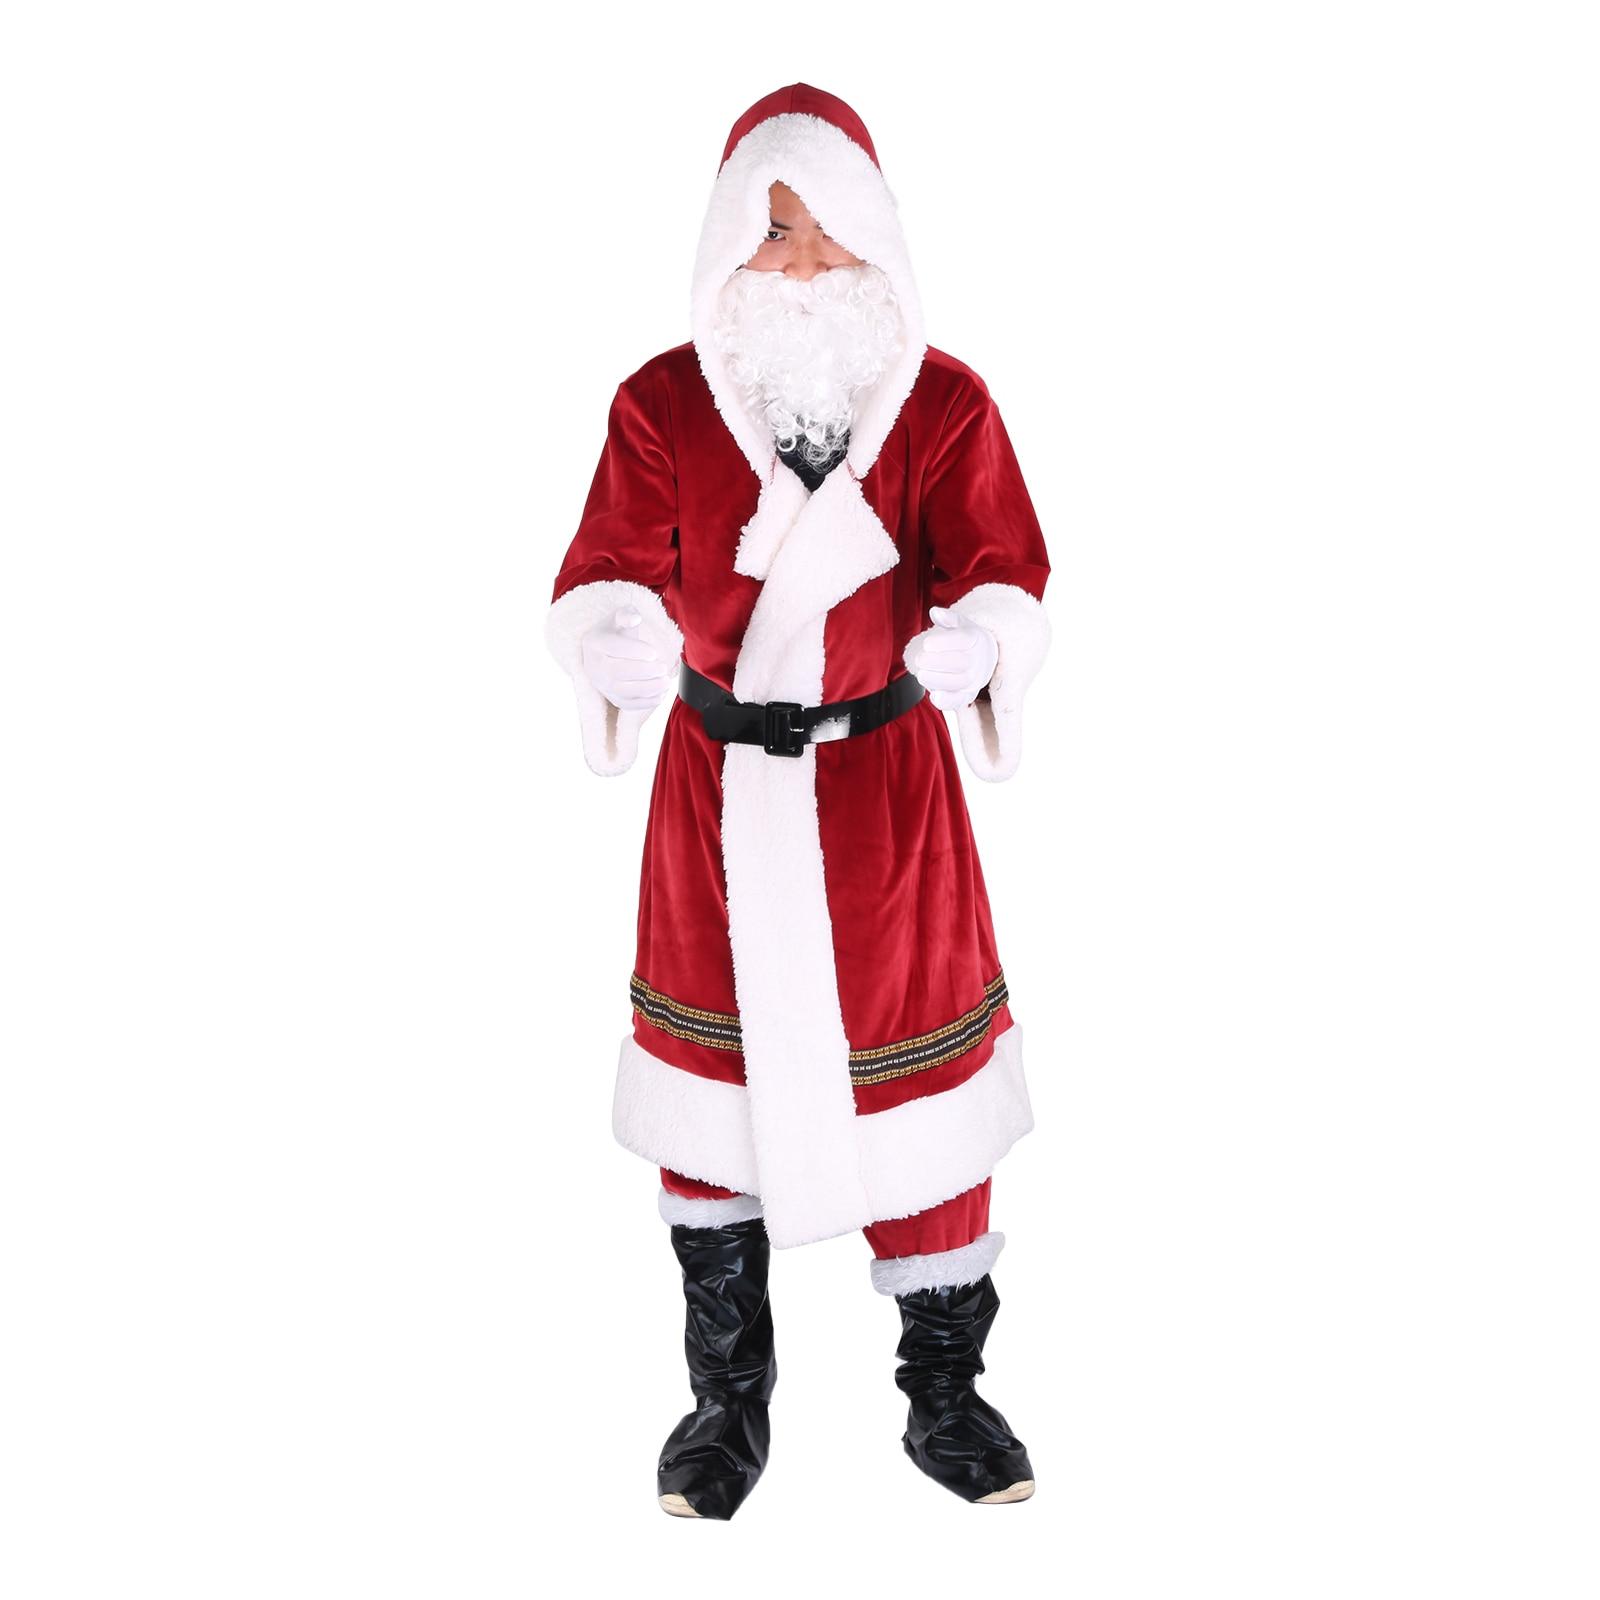 6PCS Christmas Santa Claus Costume Fancy Dress Adult Men Suits Cosplay Outfits